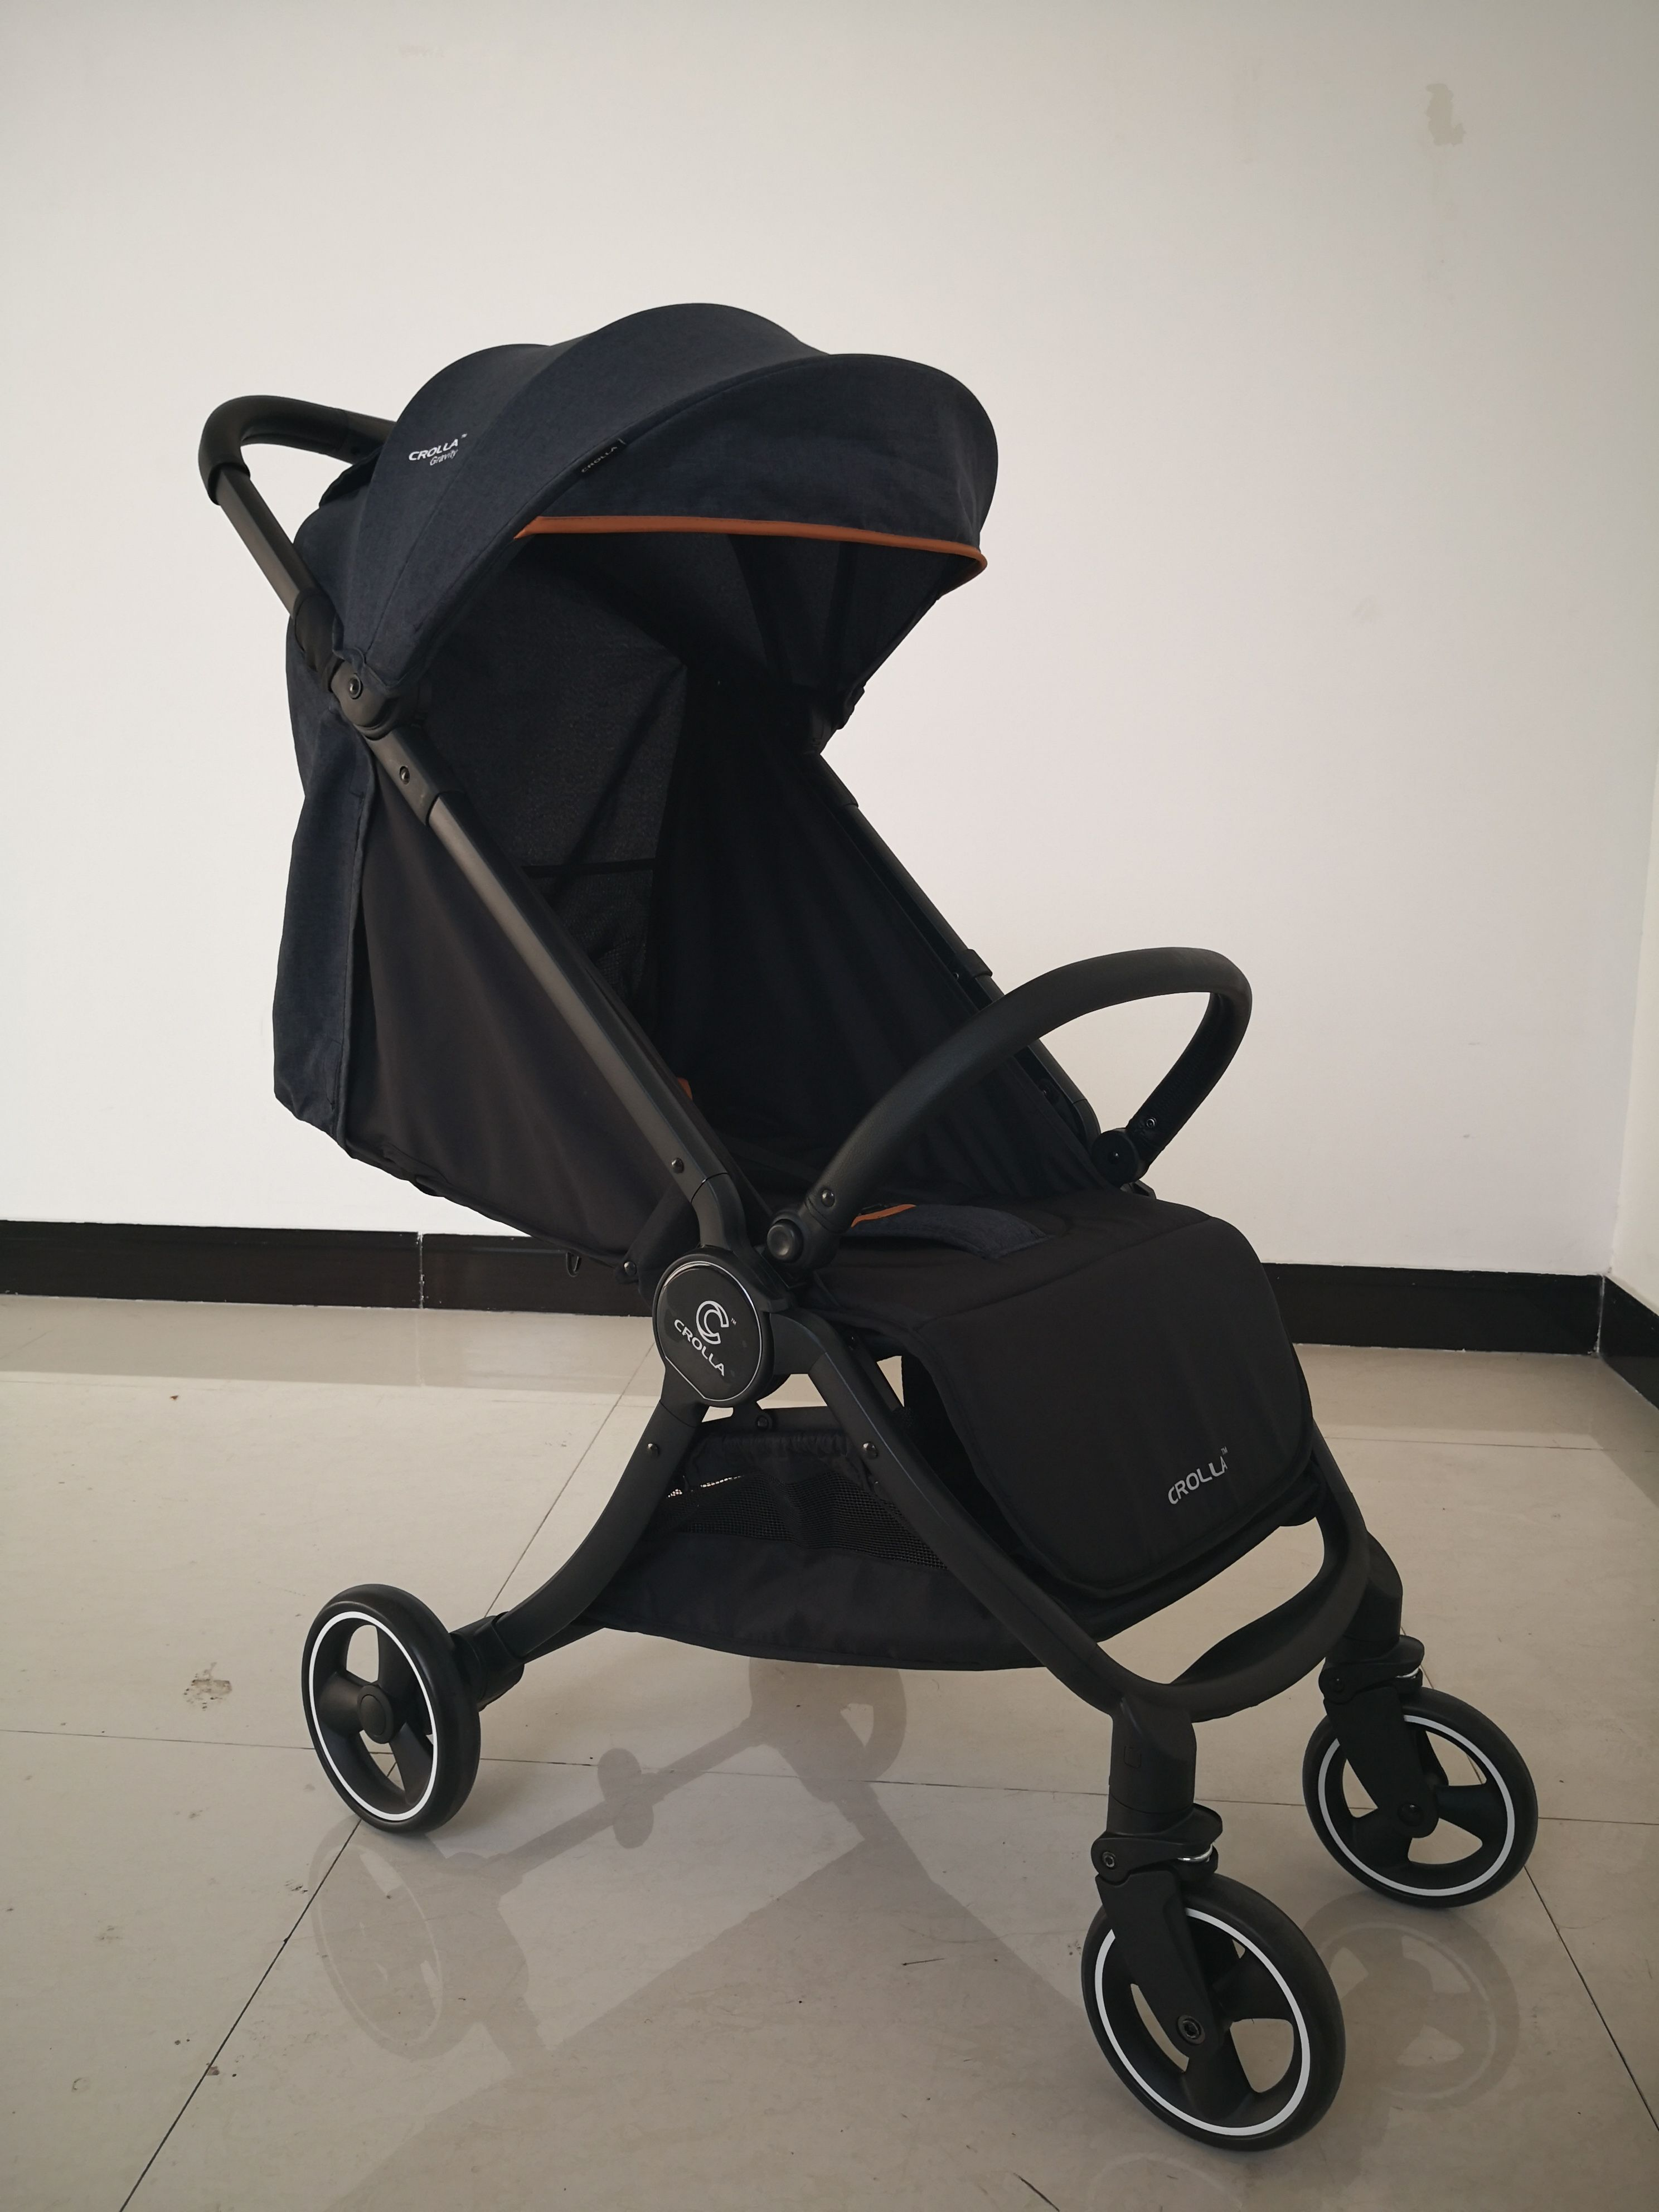 Domestic popular light portable baby stroller, lightweight ...